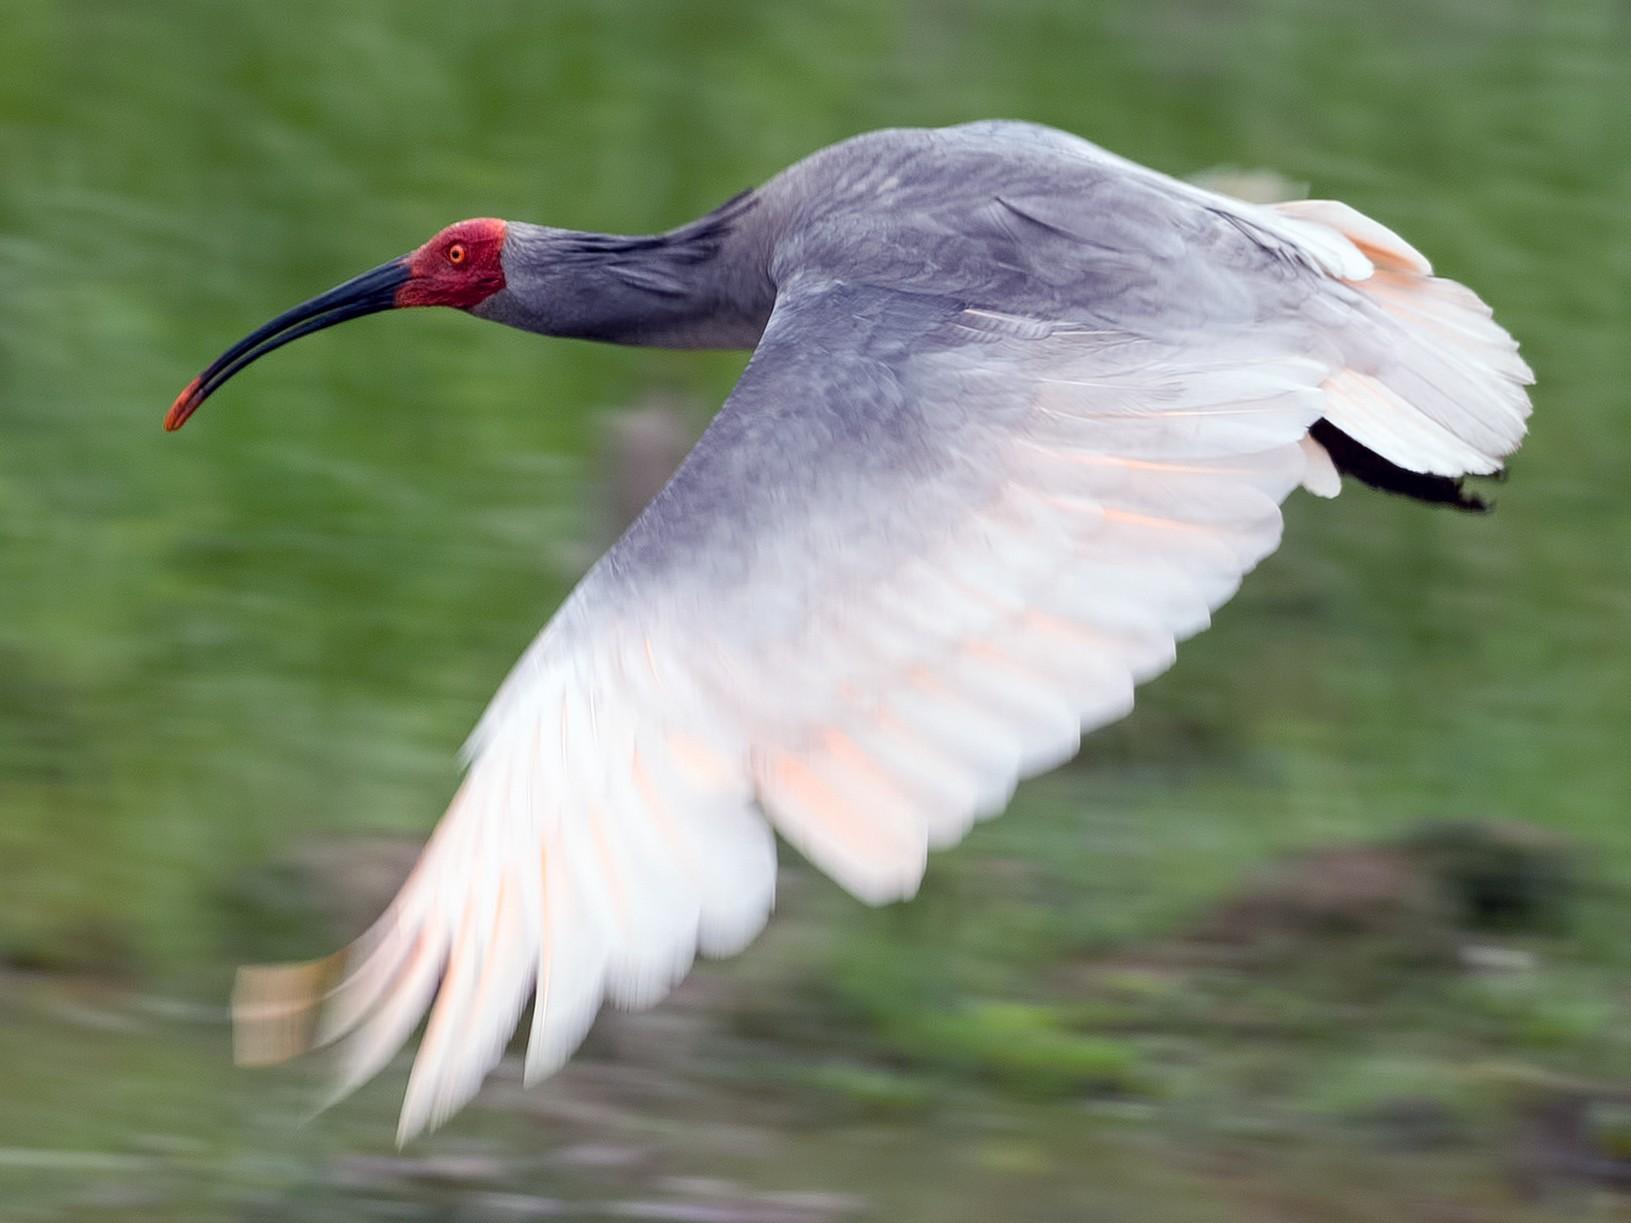 Crested Ibis - Shailesh Pinto